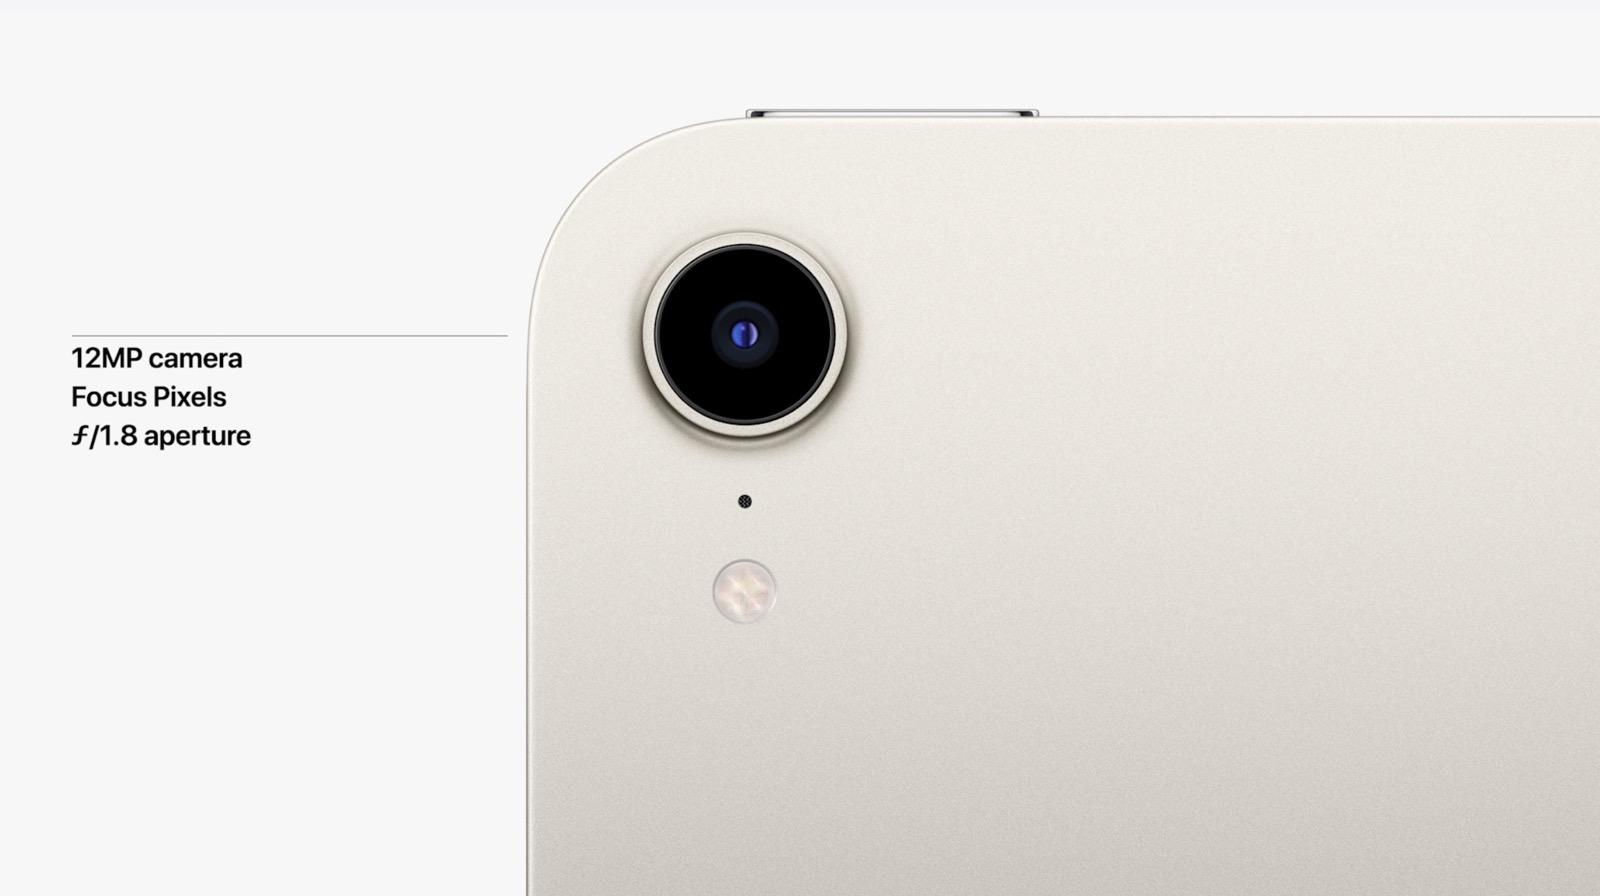 iPad mini 6 camera